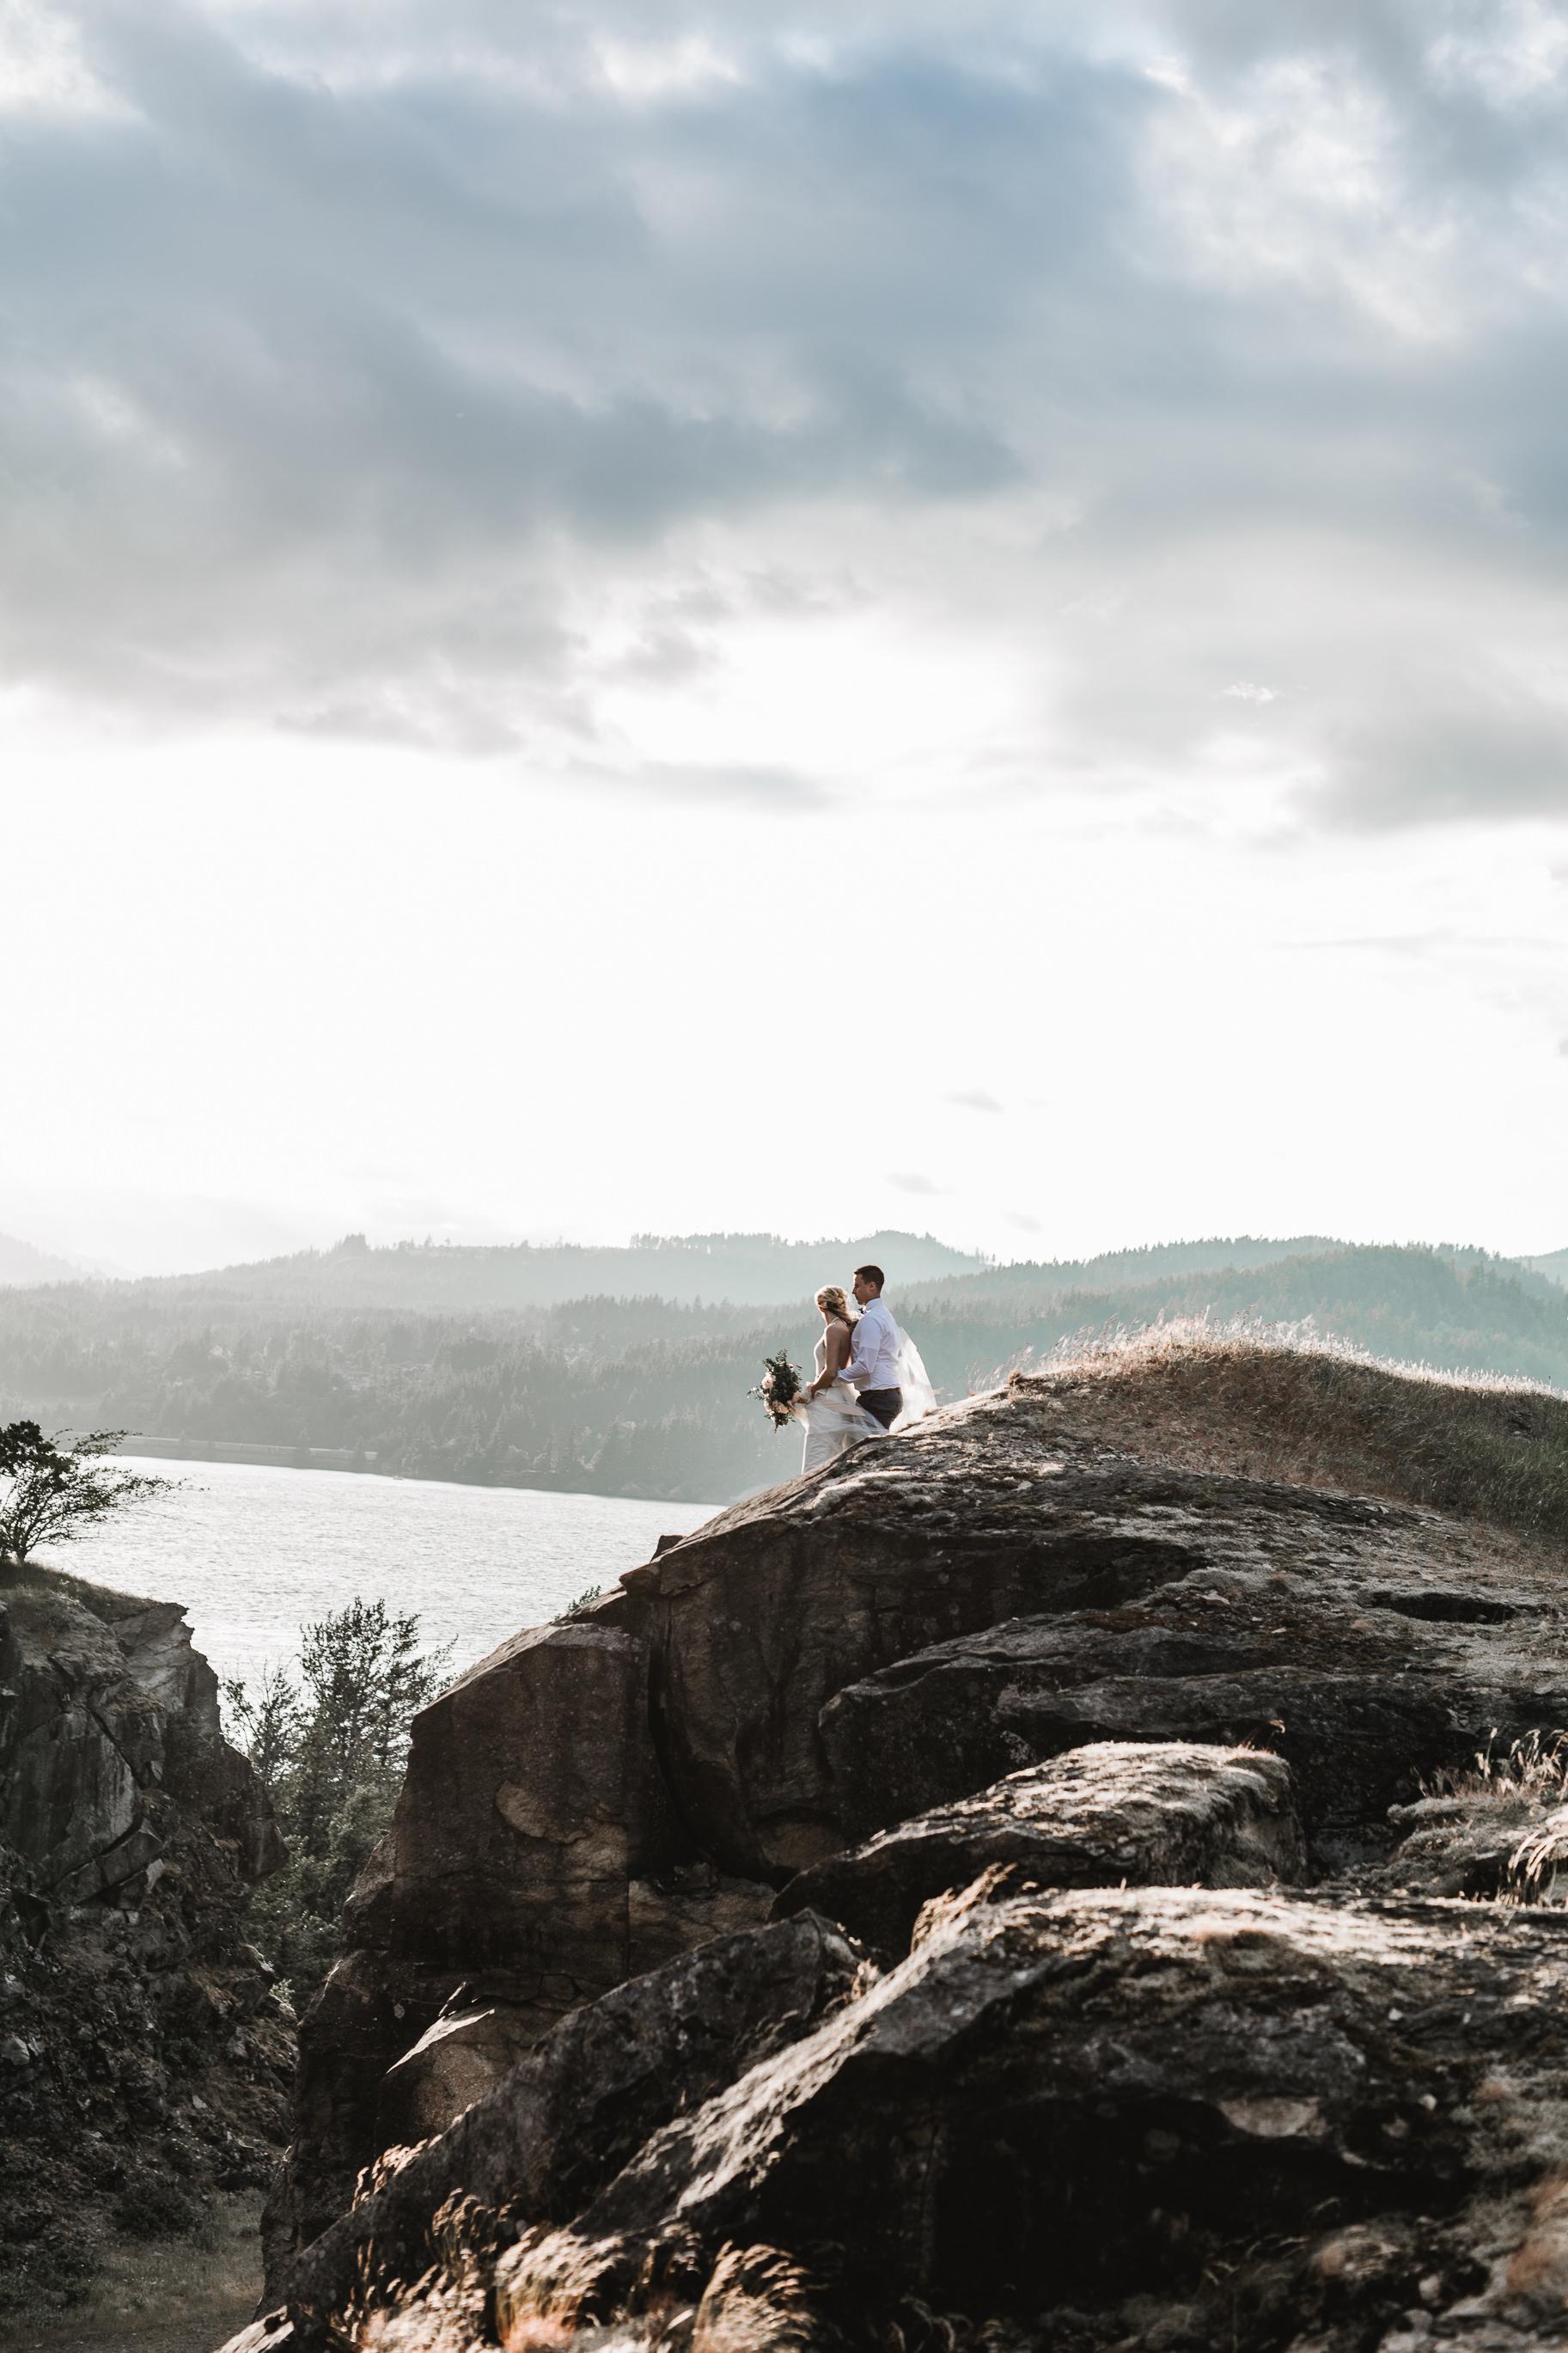 Destination Weddings - Starting at$4000